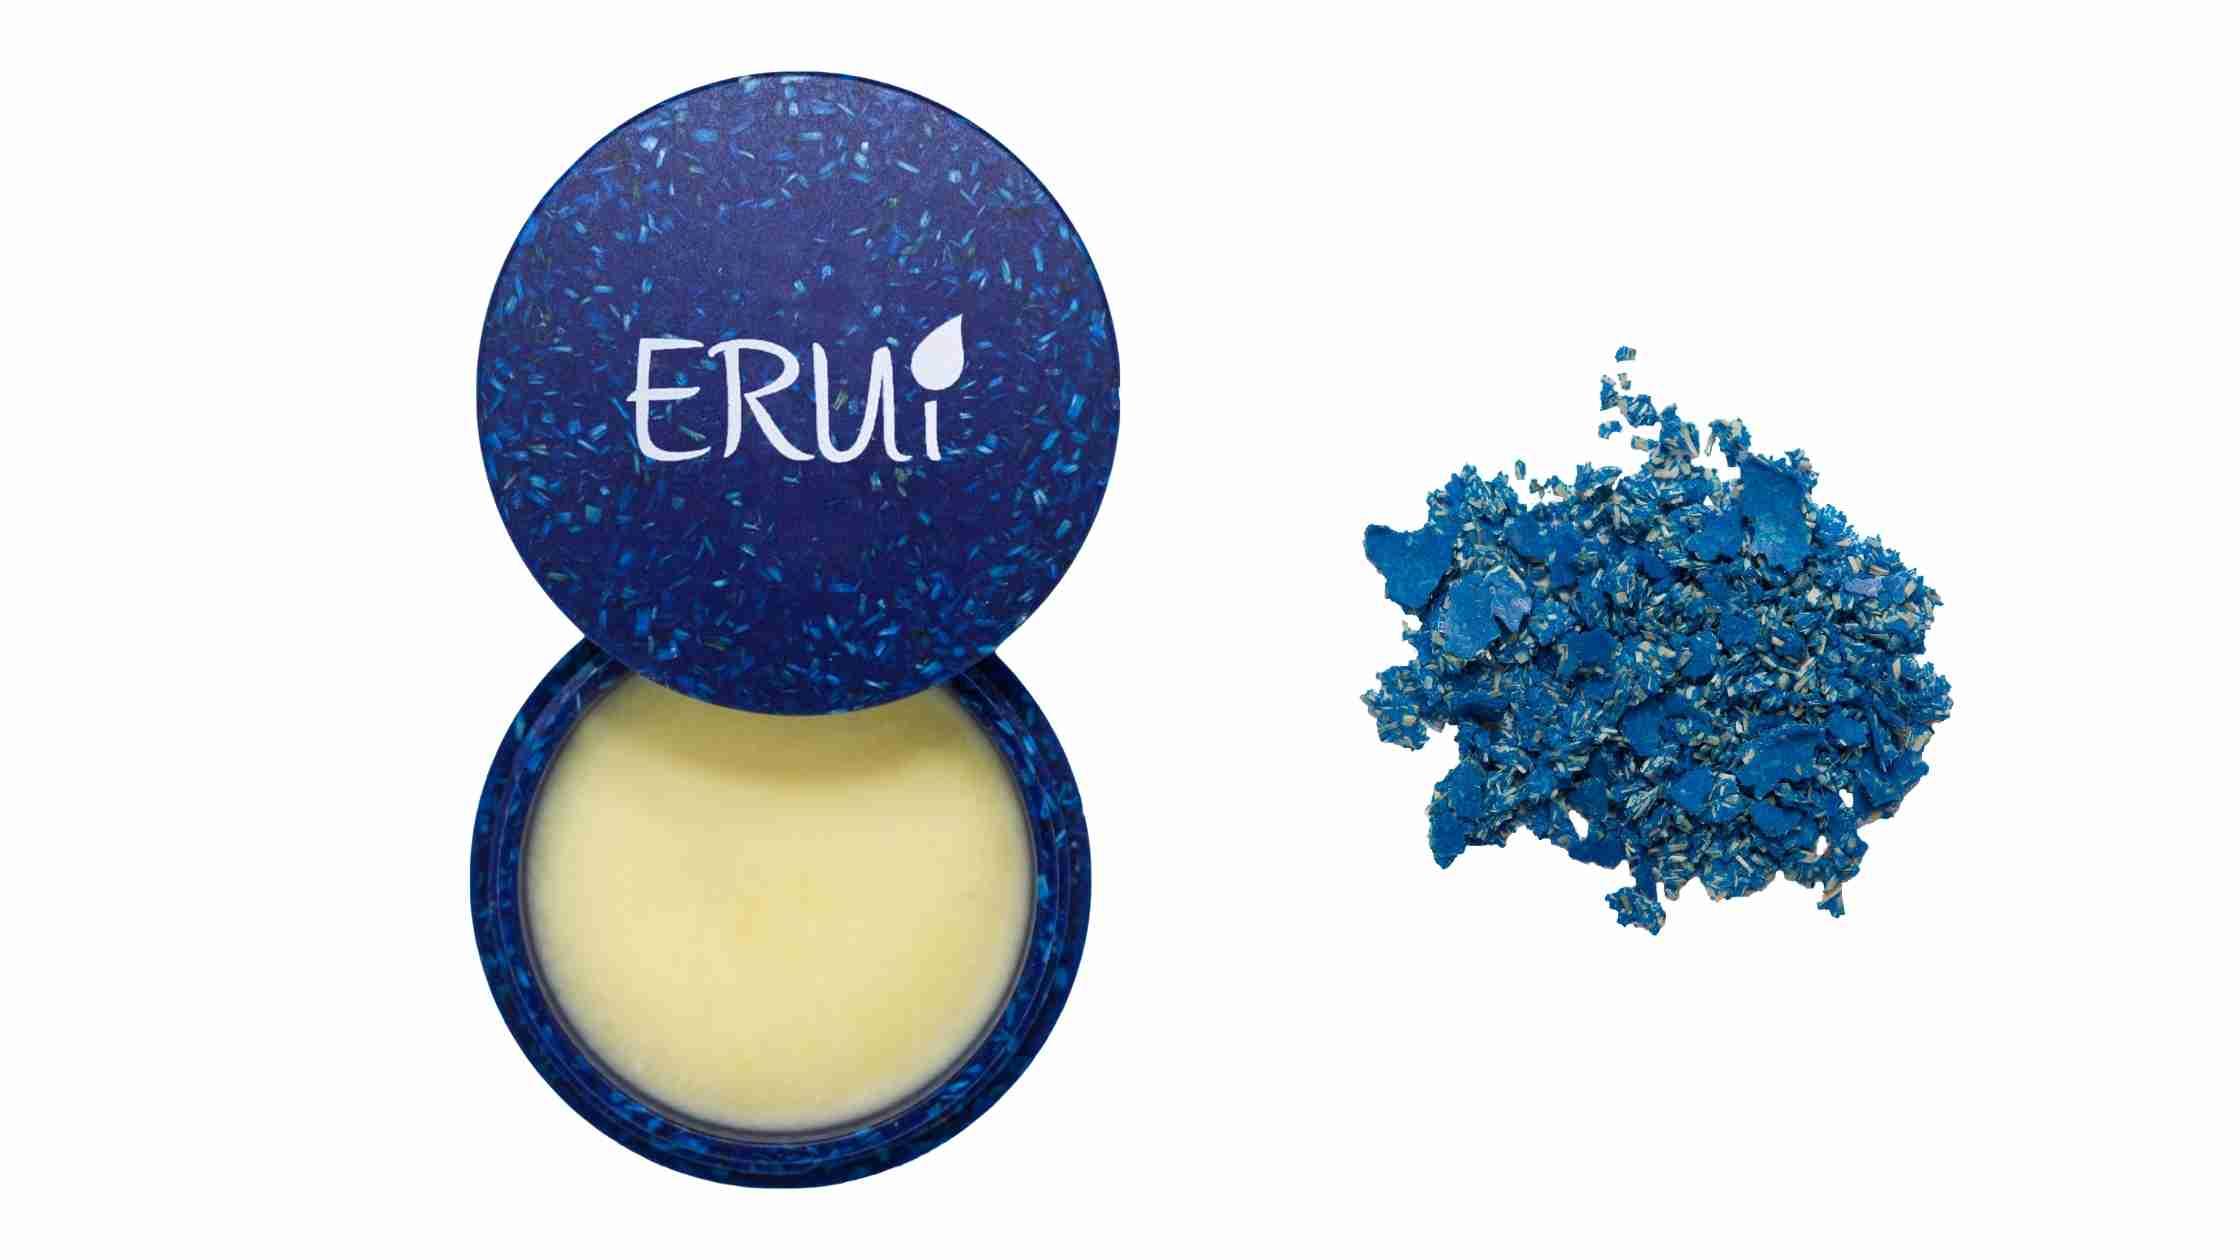 Zelena kozmetika v biološko razgradljivi embalaži brez plastike